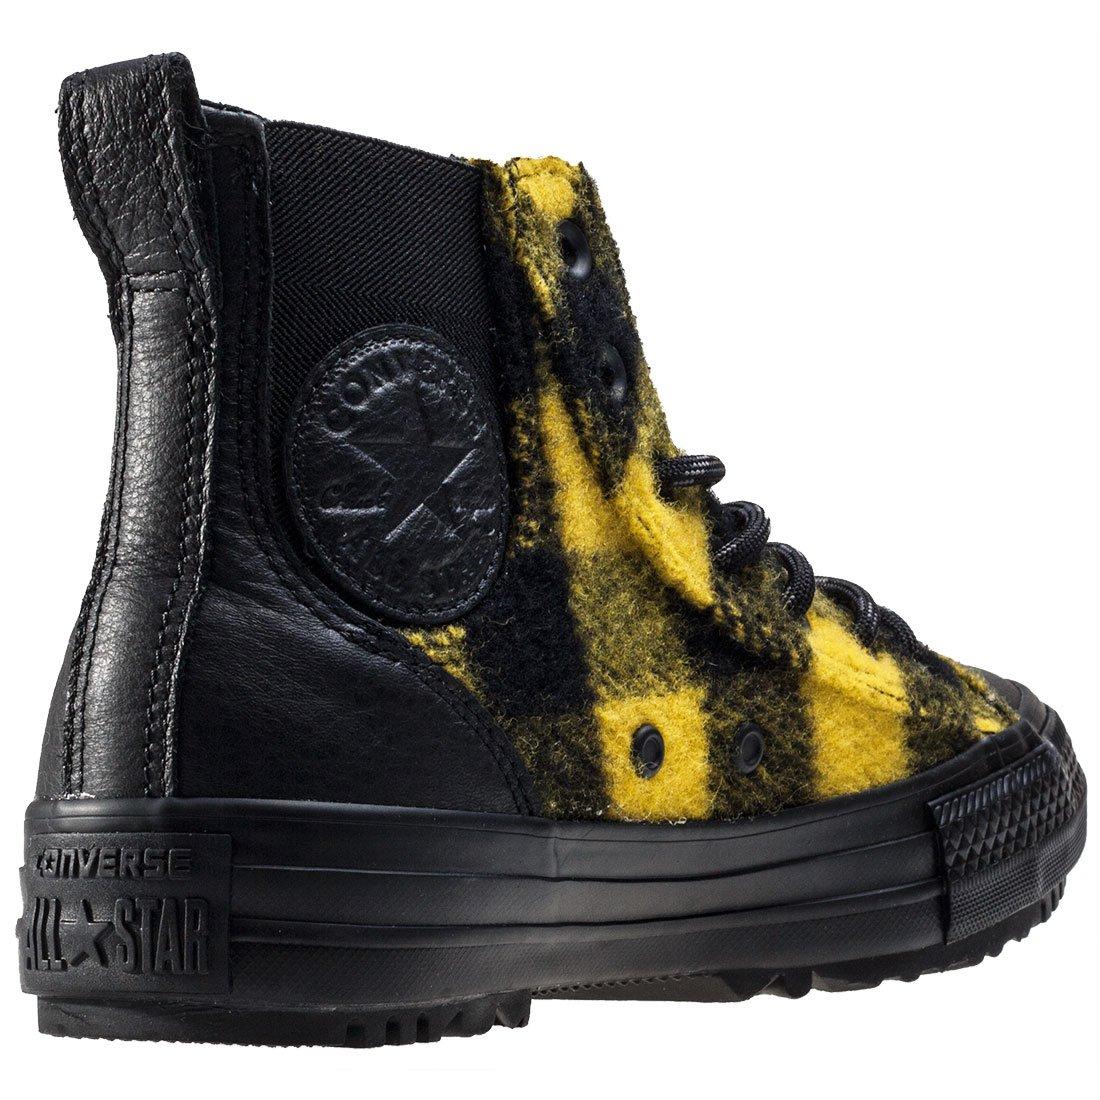 Converse x Woolrich CTAS Chelsee Womens Boot B01CF54WNI 8 B(M) US|Black/Bitter Lemon/Black